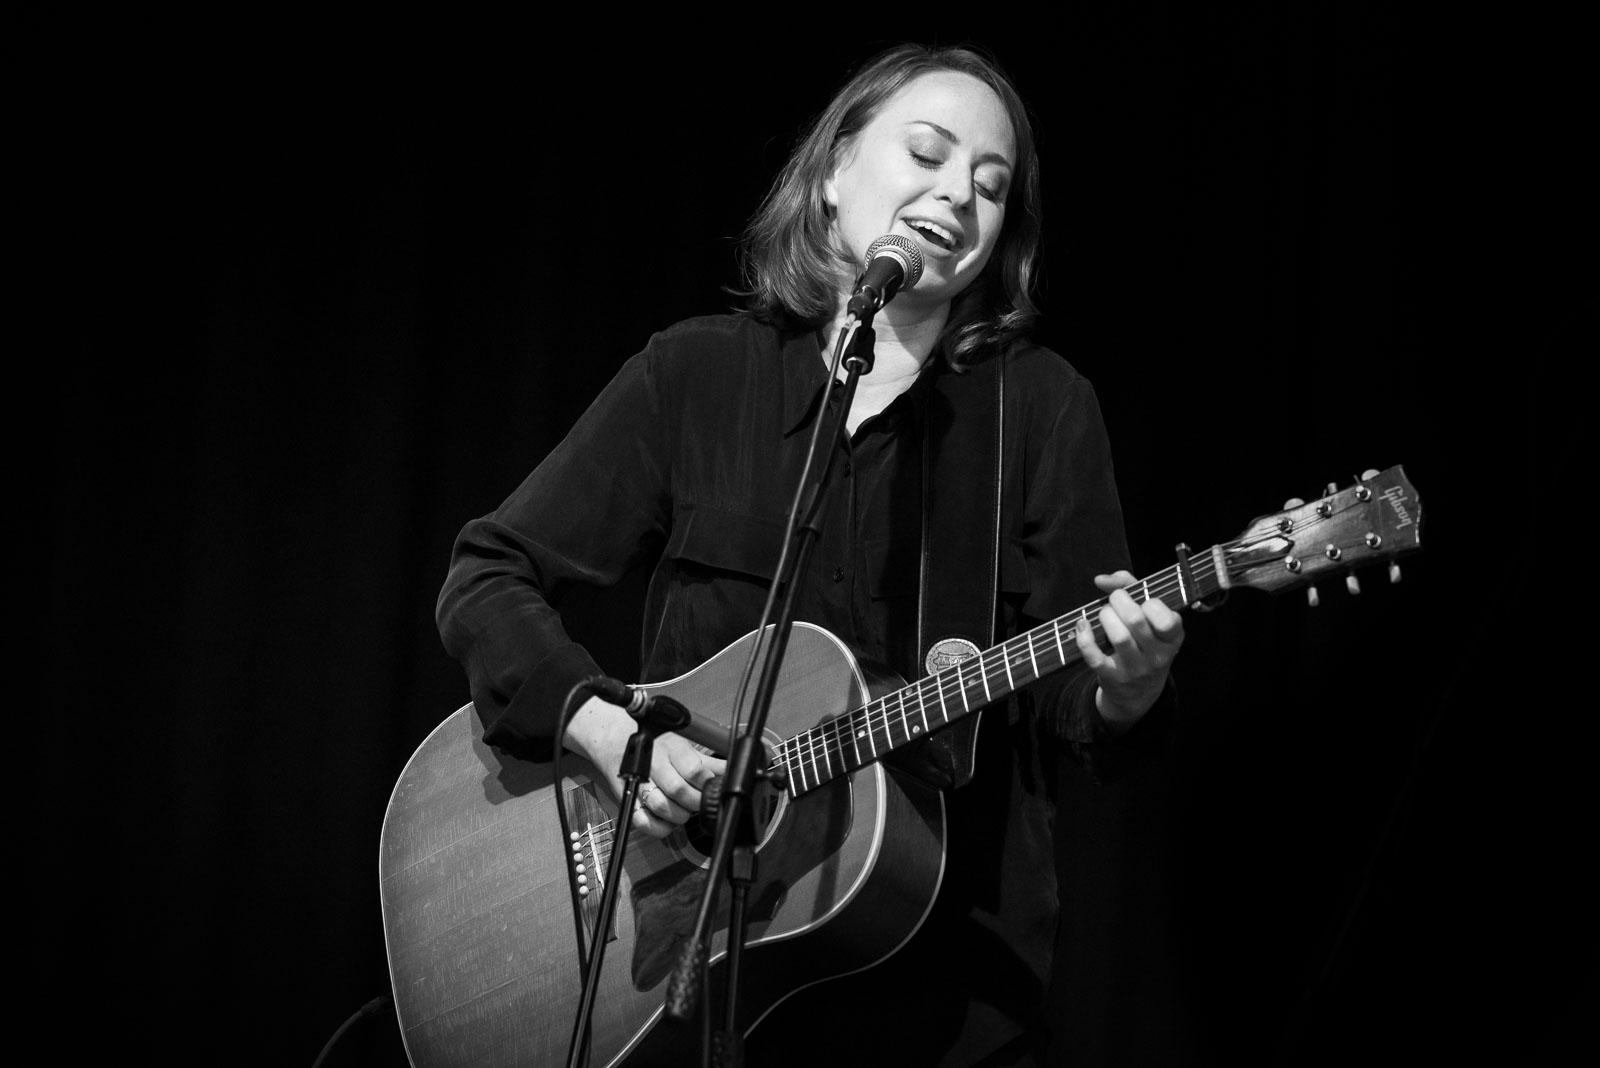 Stephanie Struijk Parelsessies Concertfoto Close-up